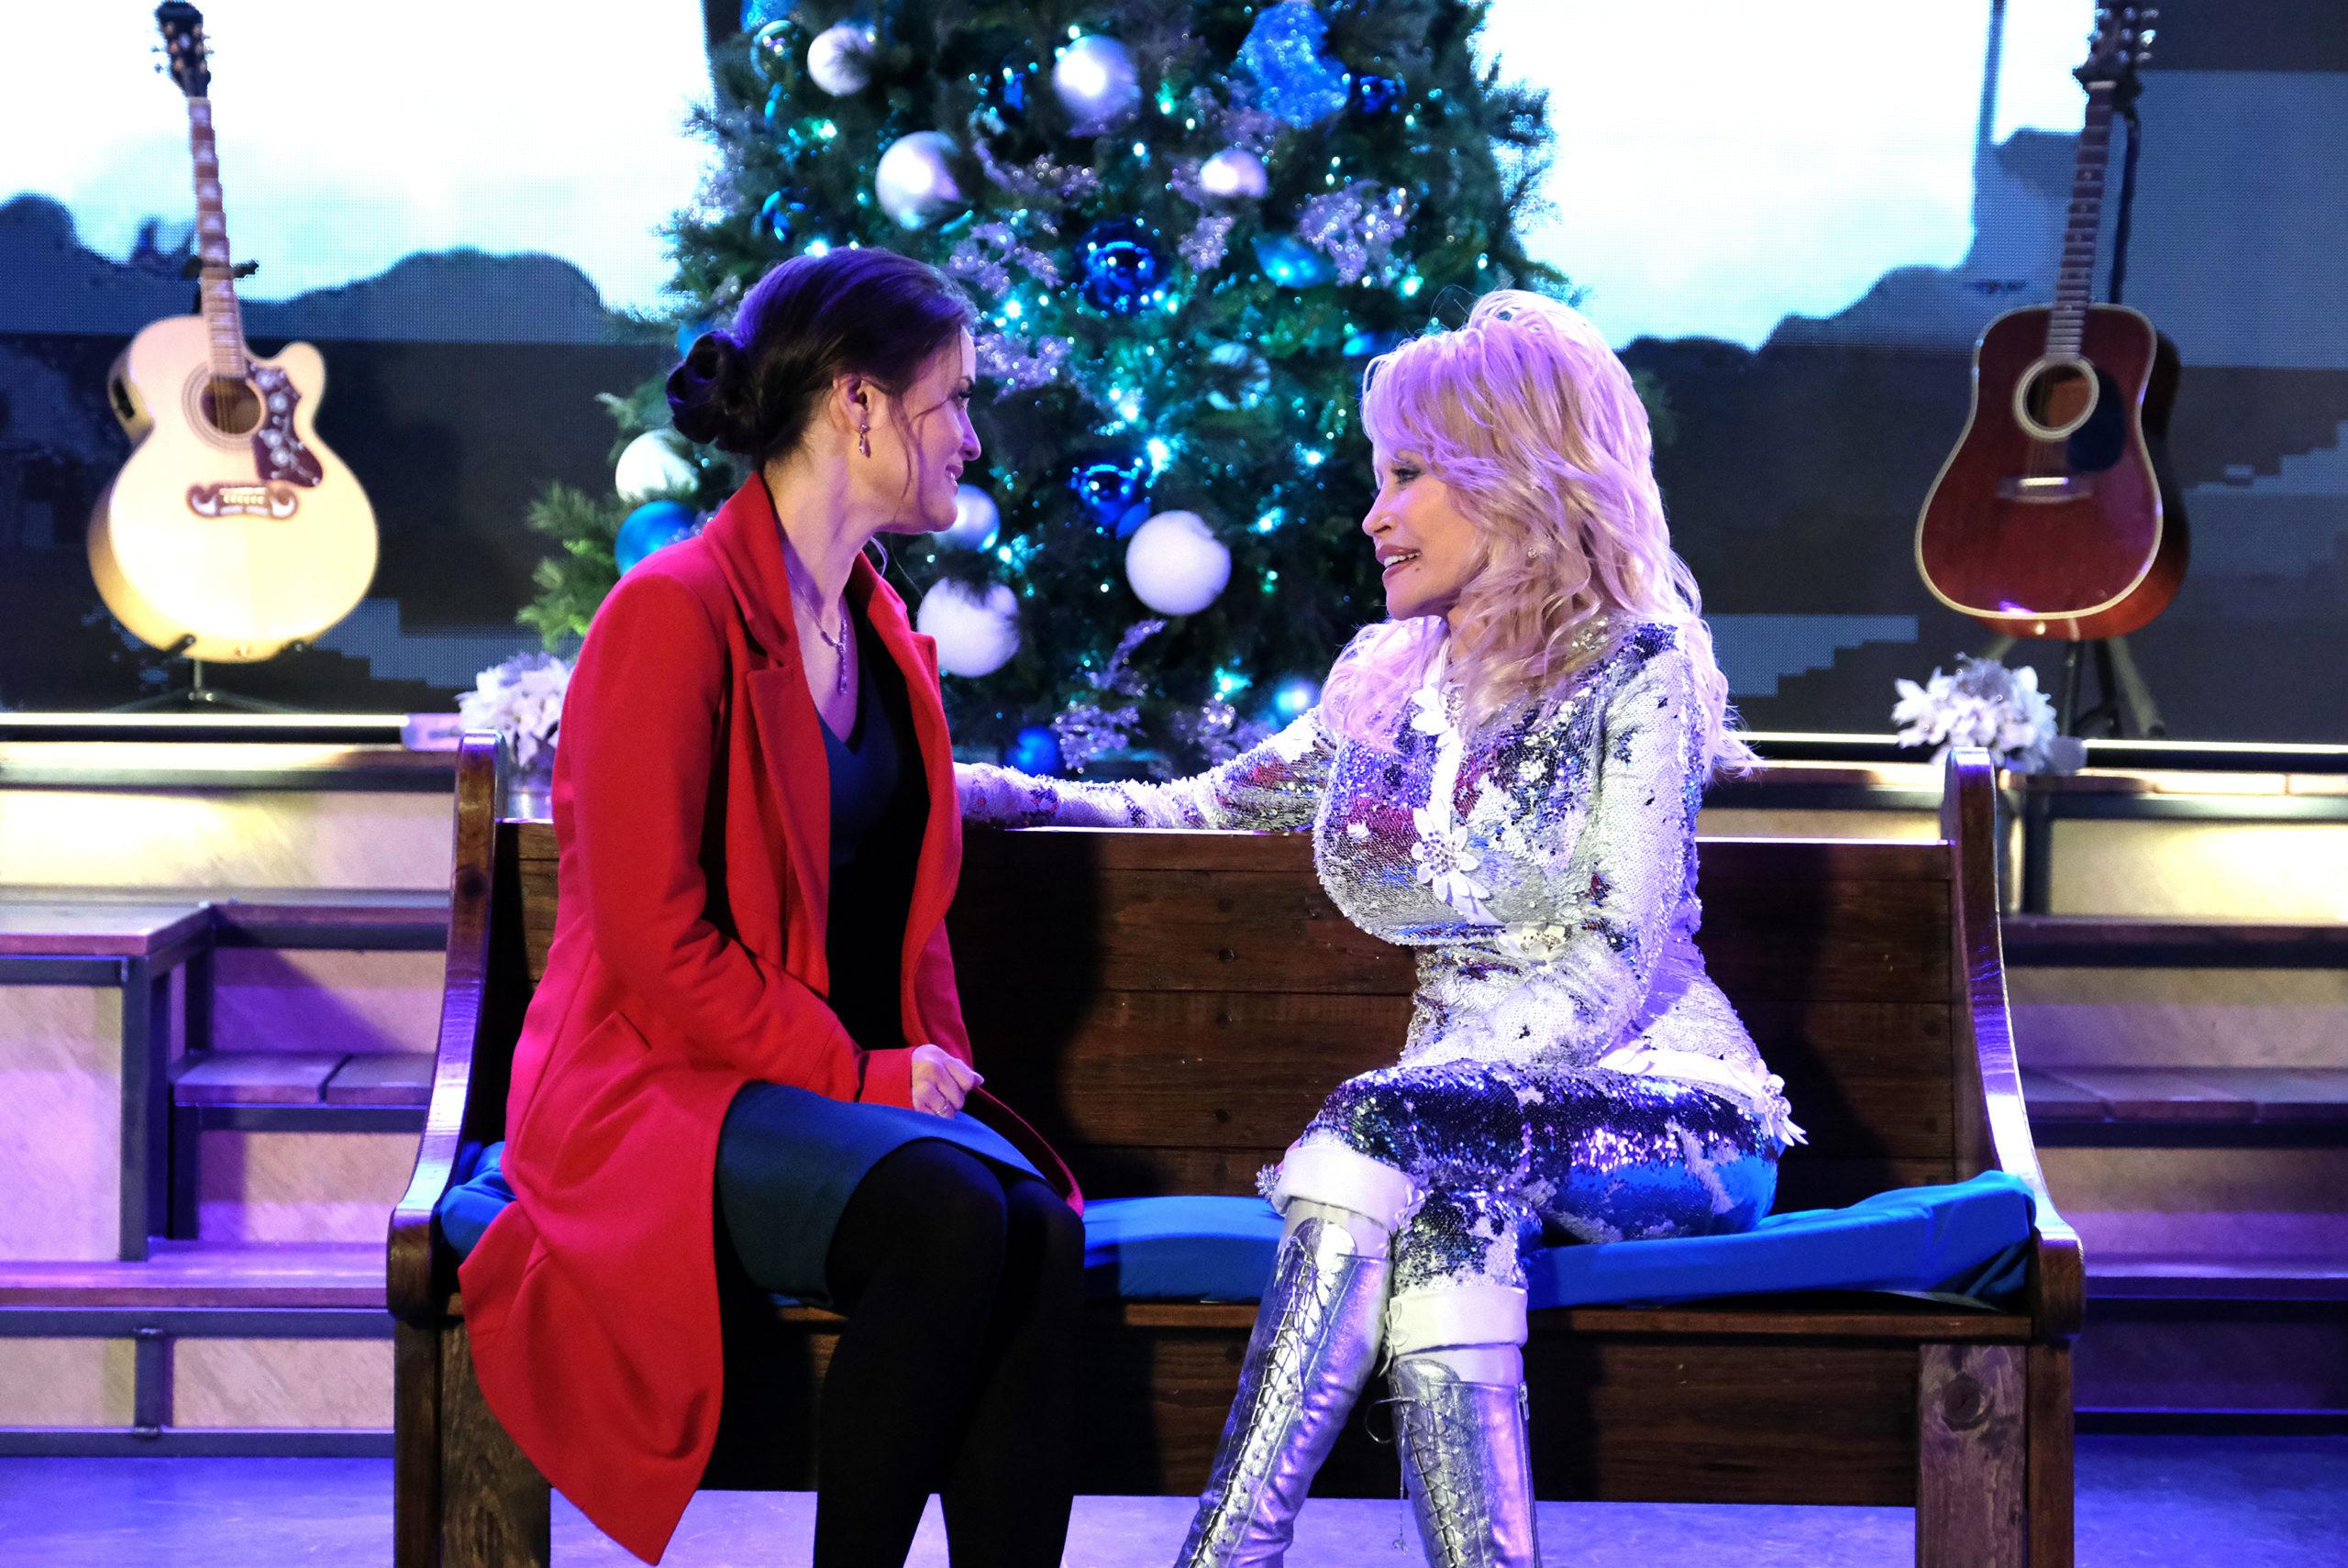 Hallmark Christmas Movies - Christmas at Dollywood - Curtis Hilbun - Crown Media - 01